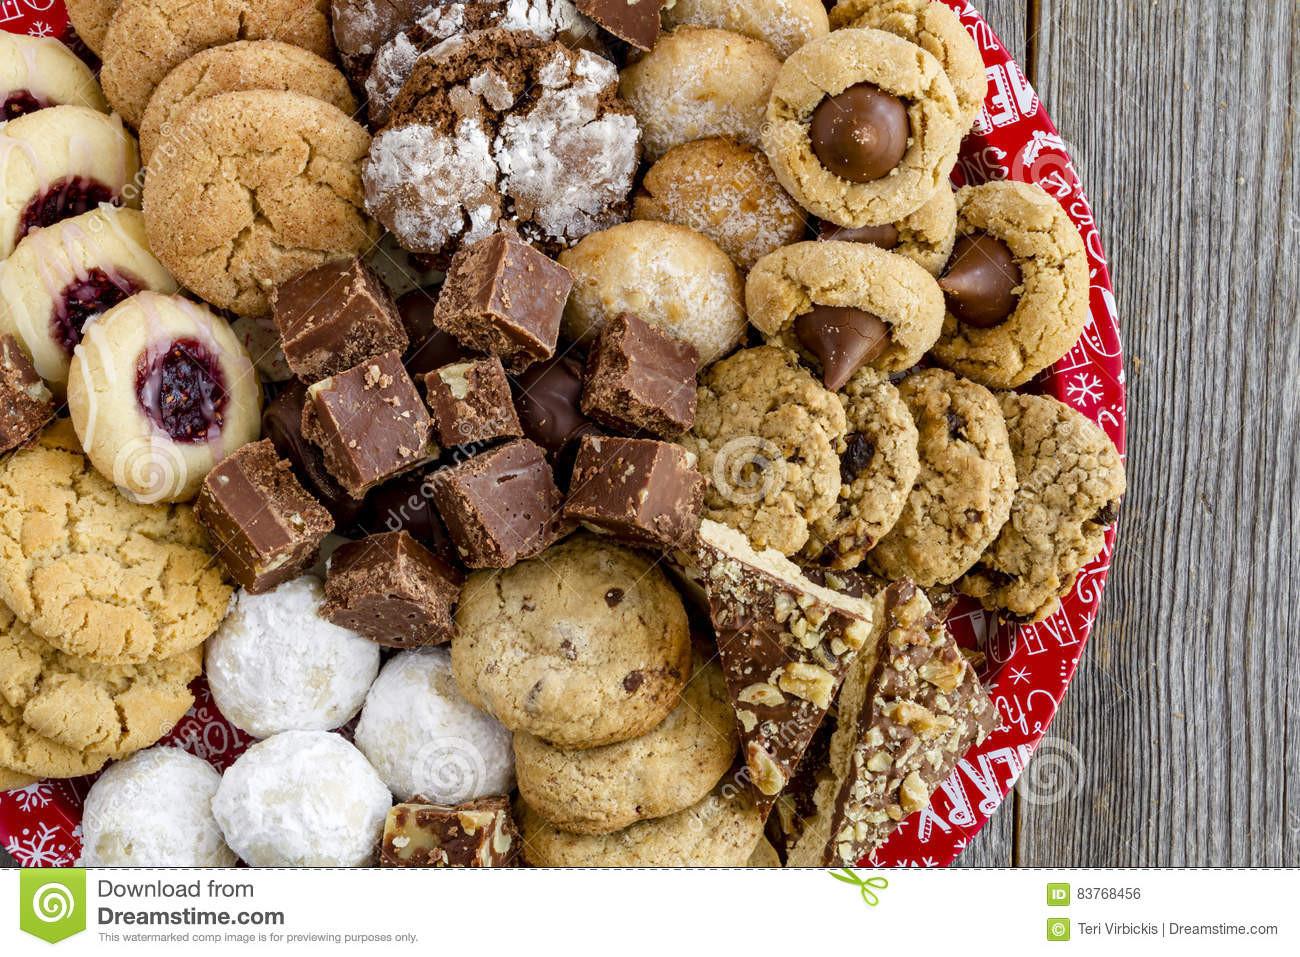 Christmas Cookies To Buy  Buy Christmas cookies help educate a chef